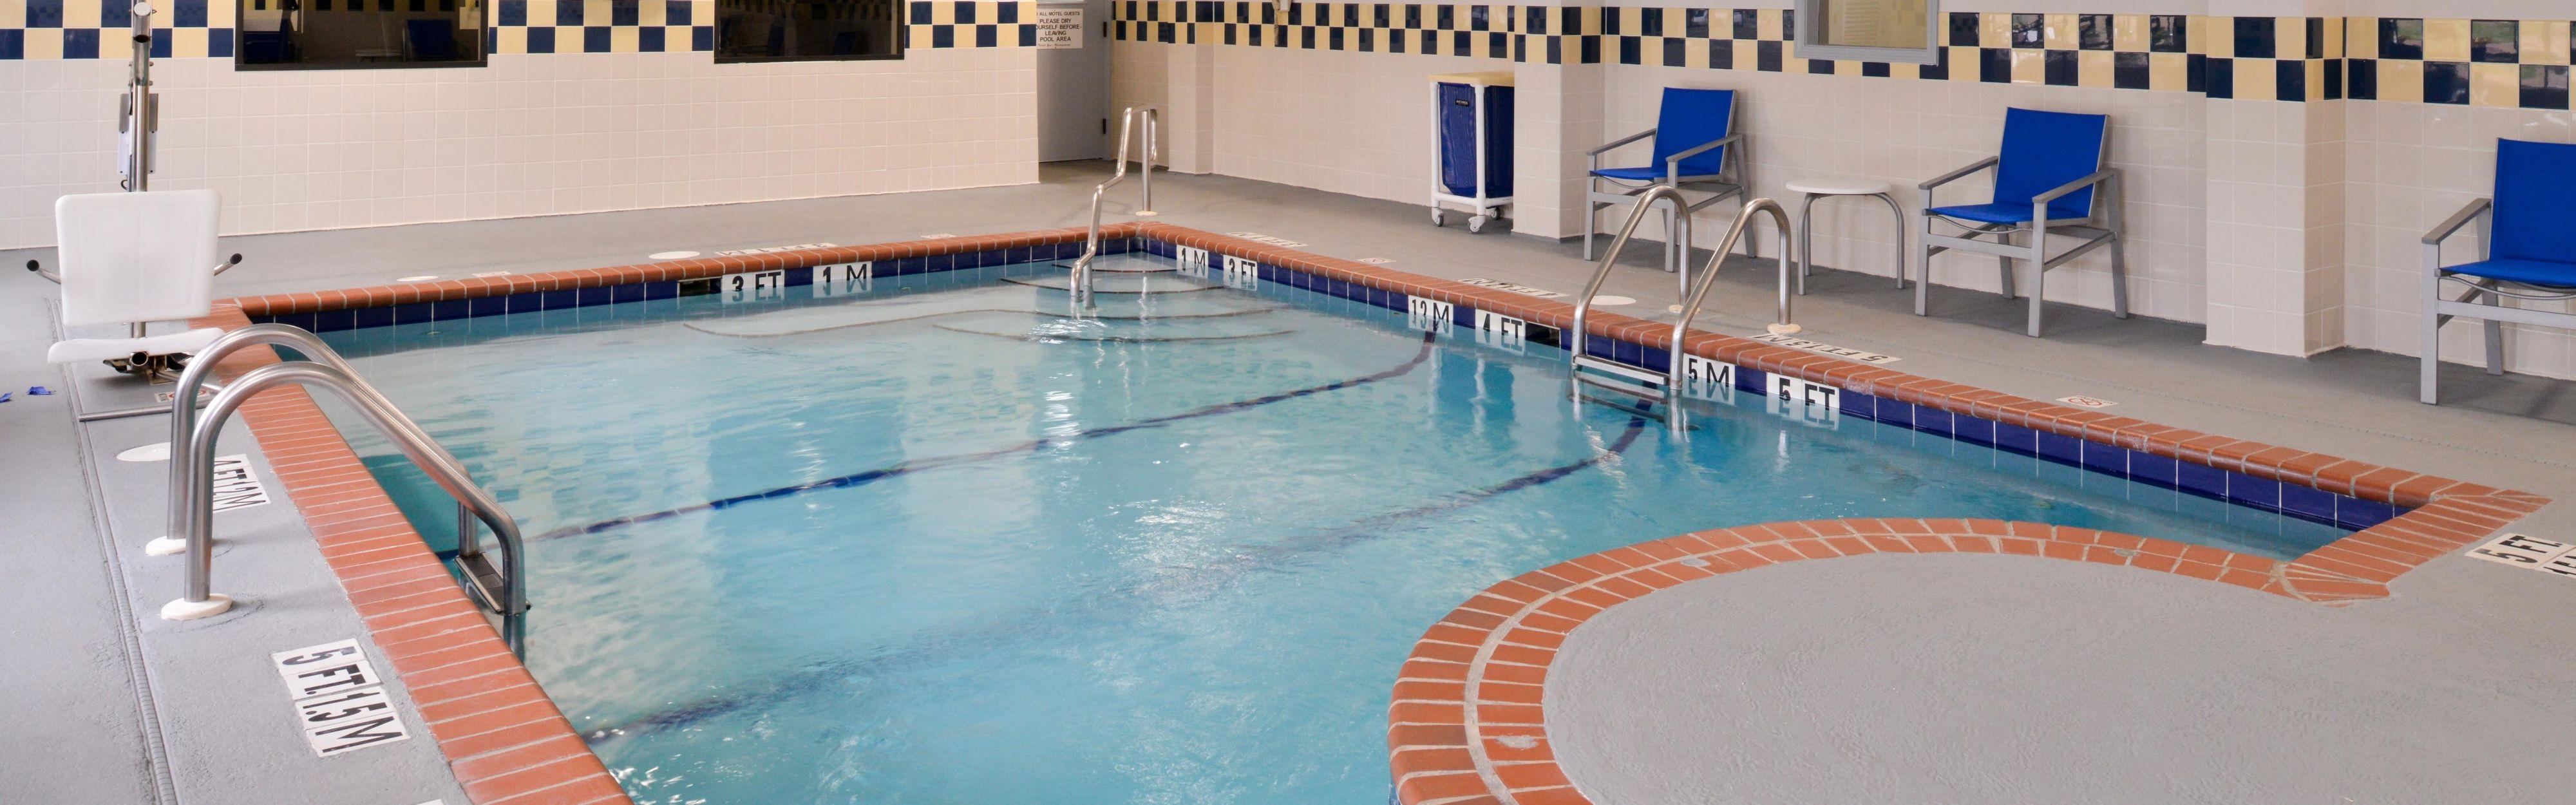 Holiday Inn Express Clanton image 2